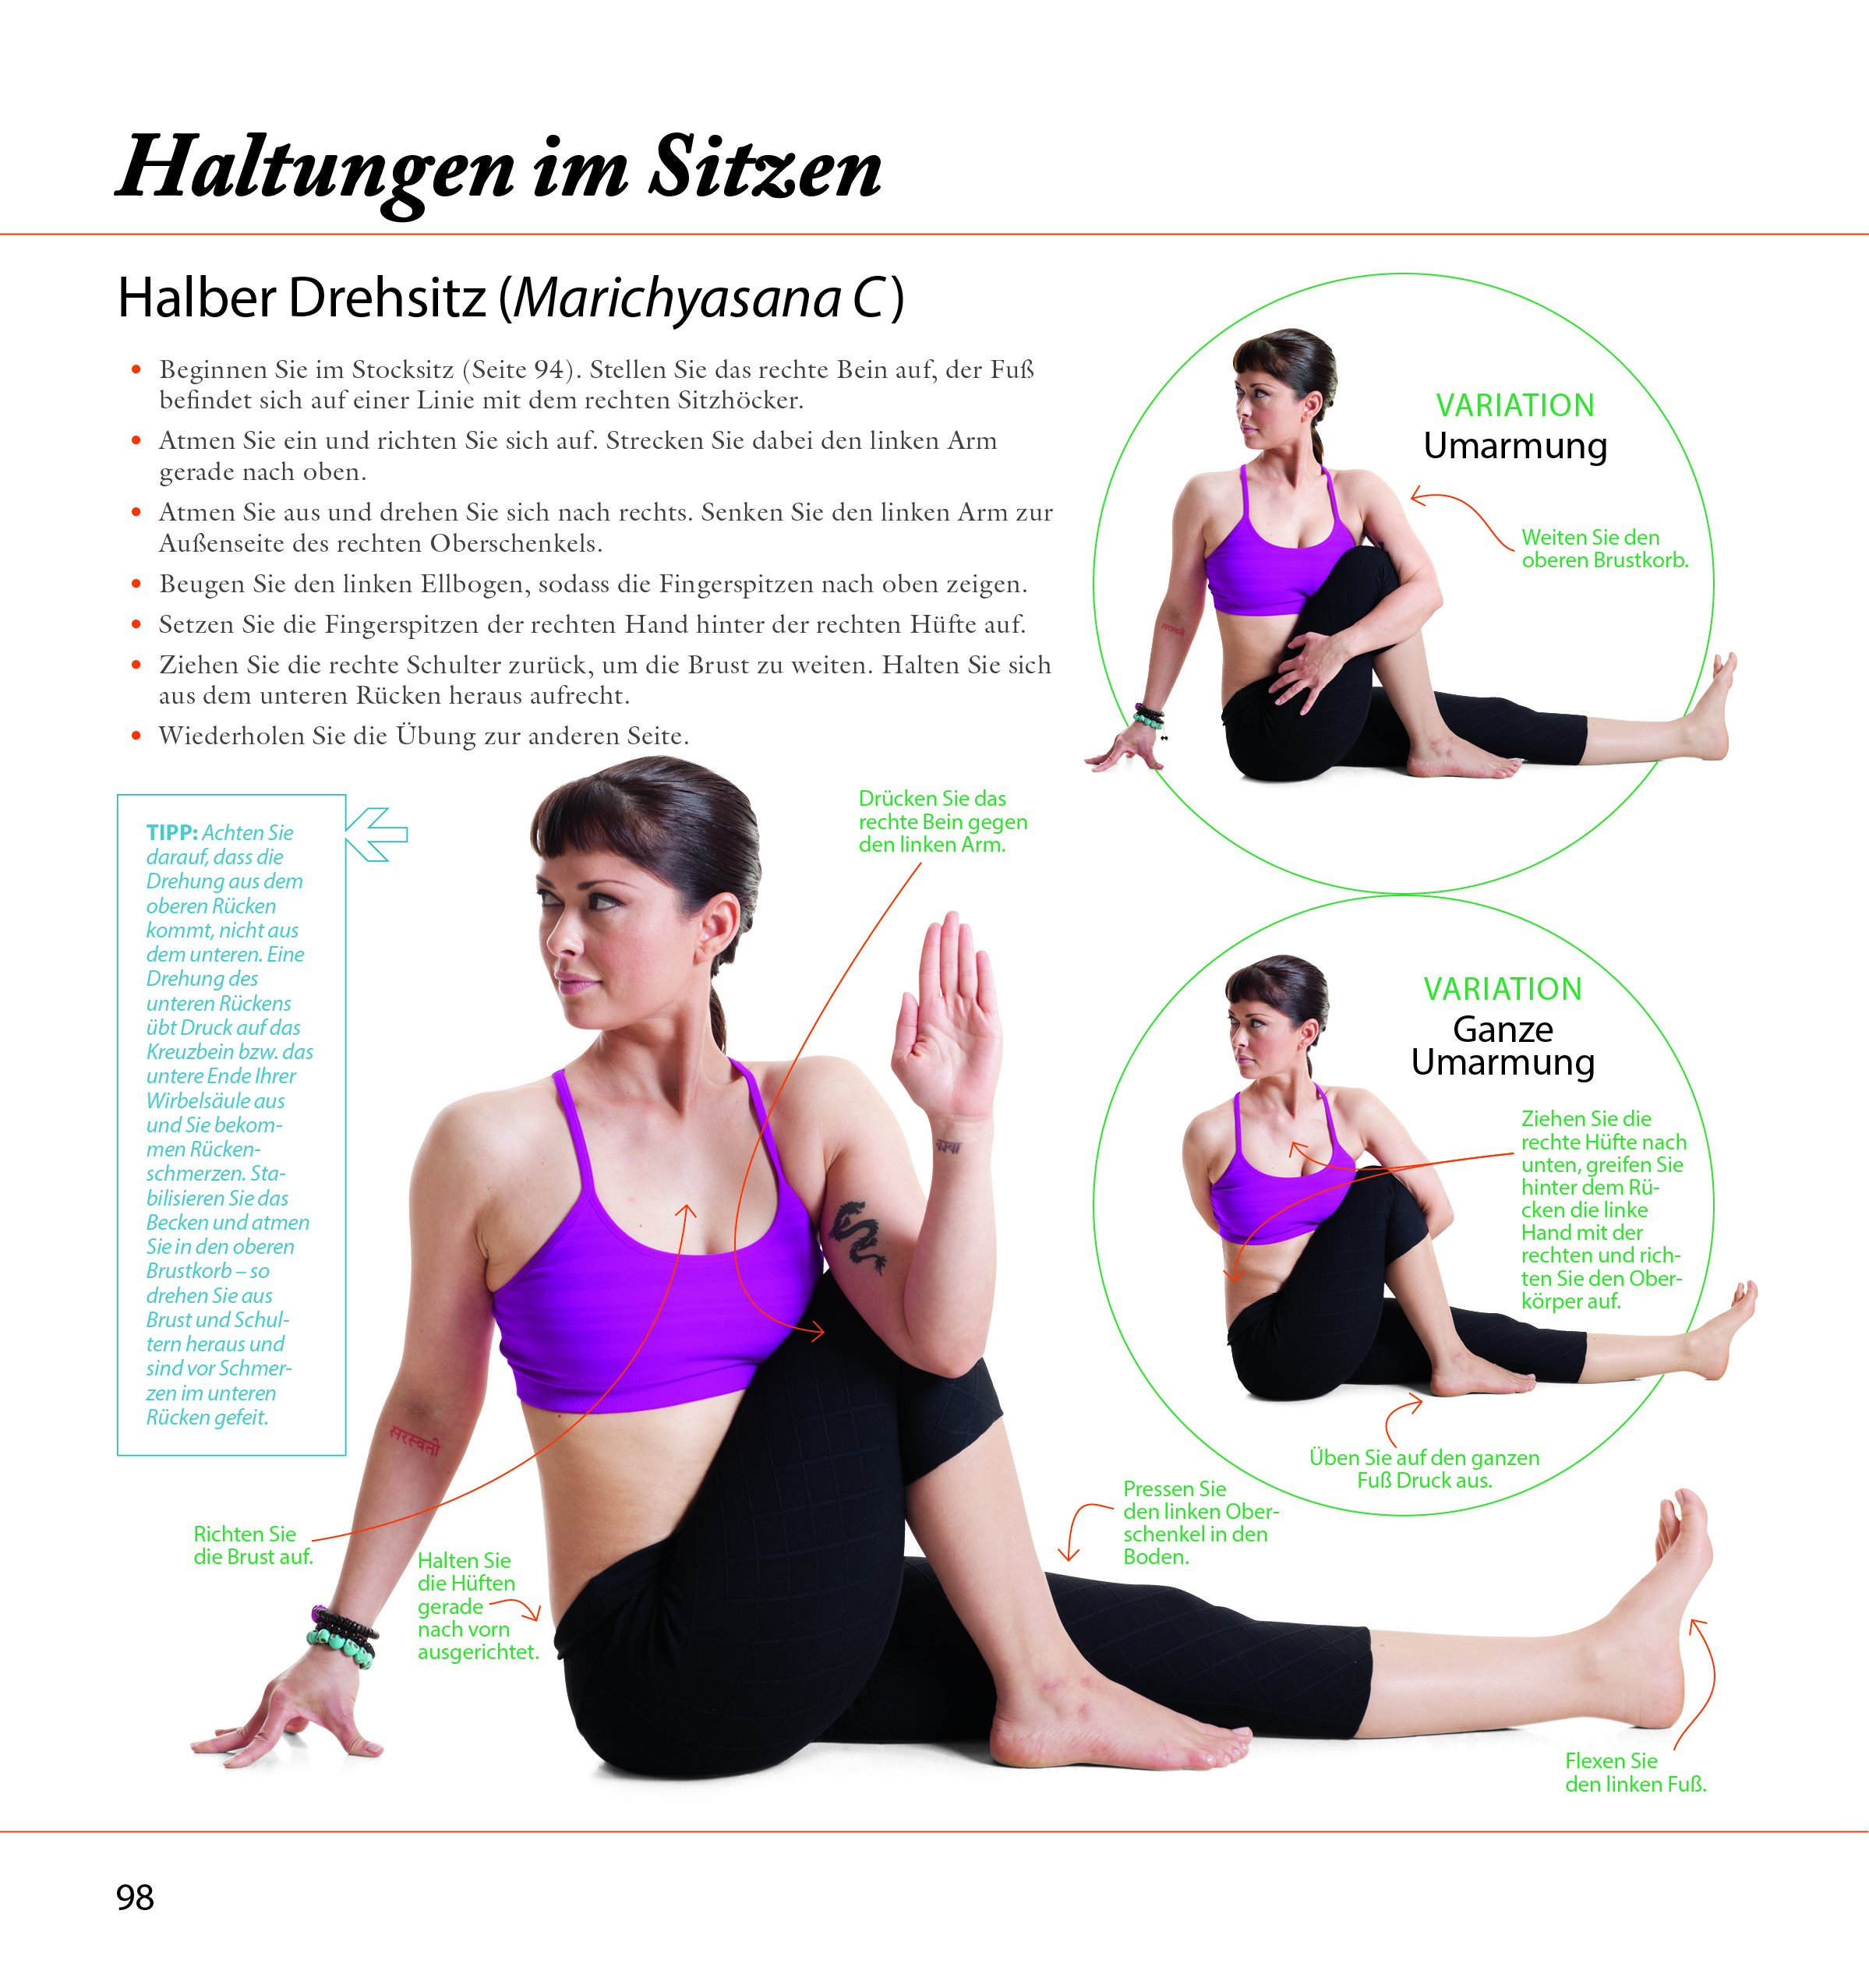 Das Womens Health Yoga-Buch: 9783517092539: Amazon.com: Books